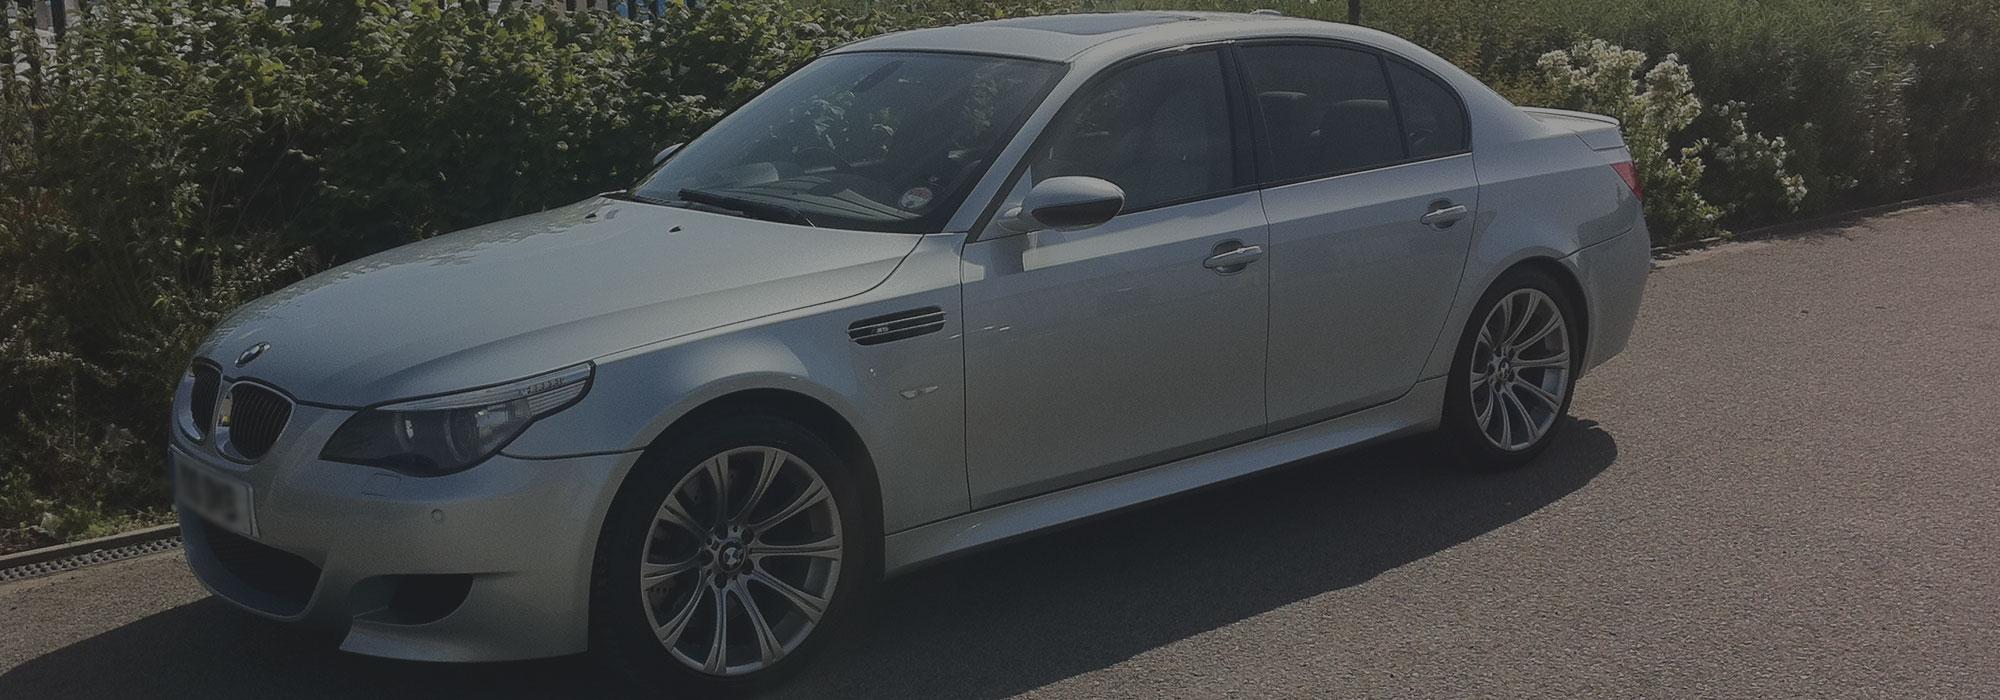 BMW M Vanos & Engine Rebuild Specialists | Mr Vanos